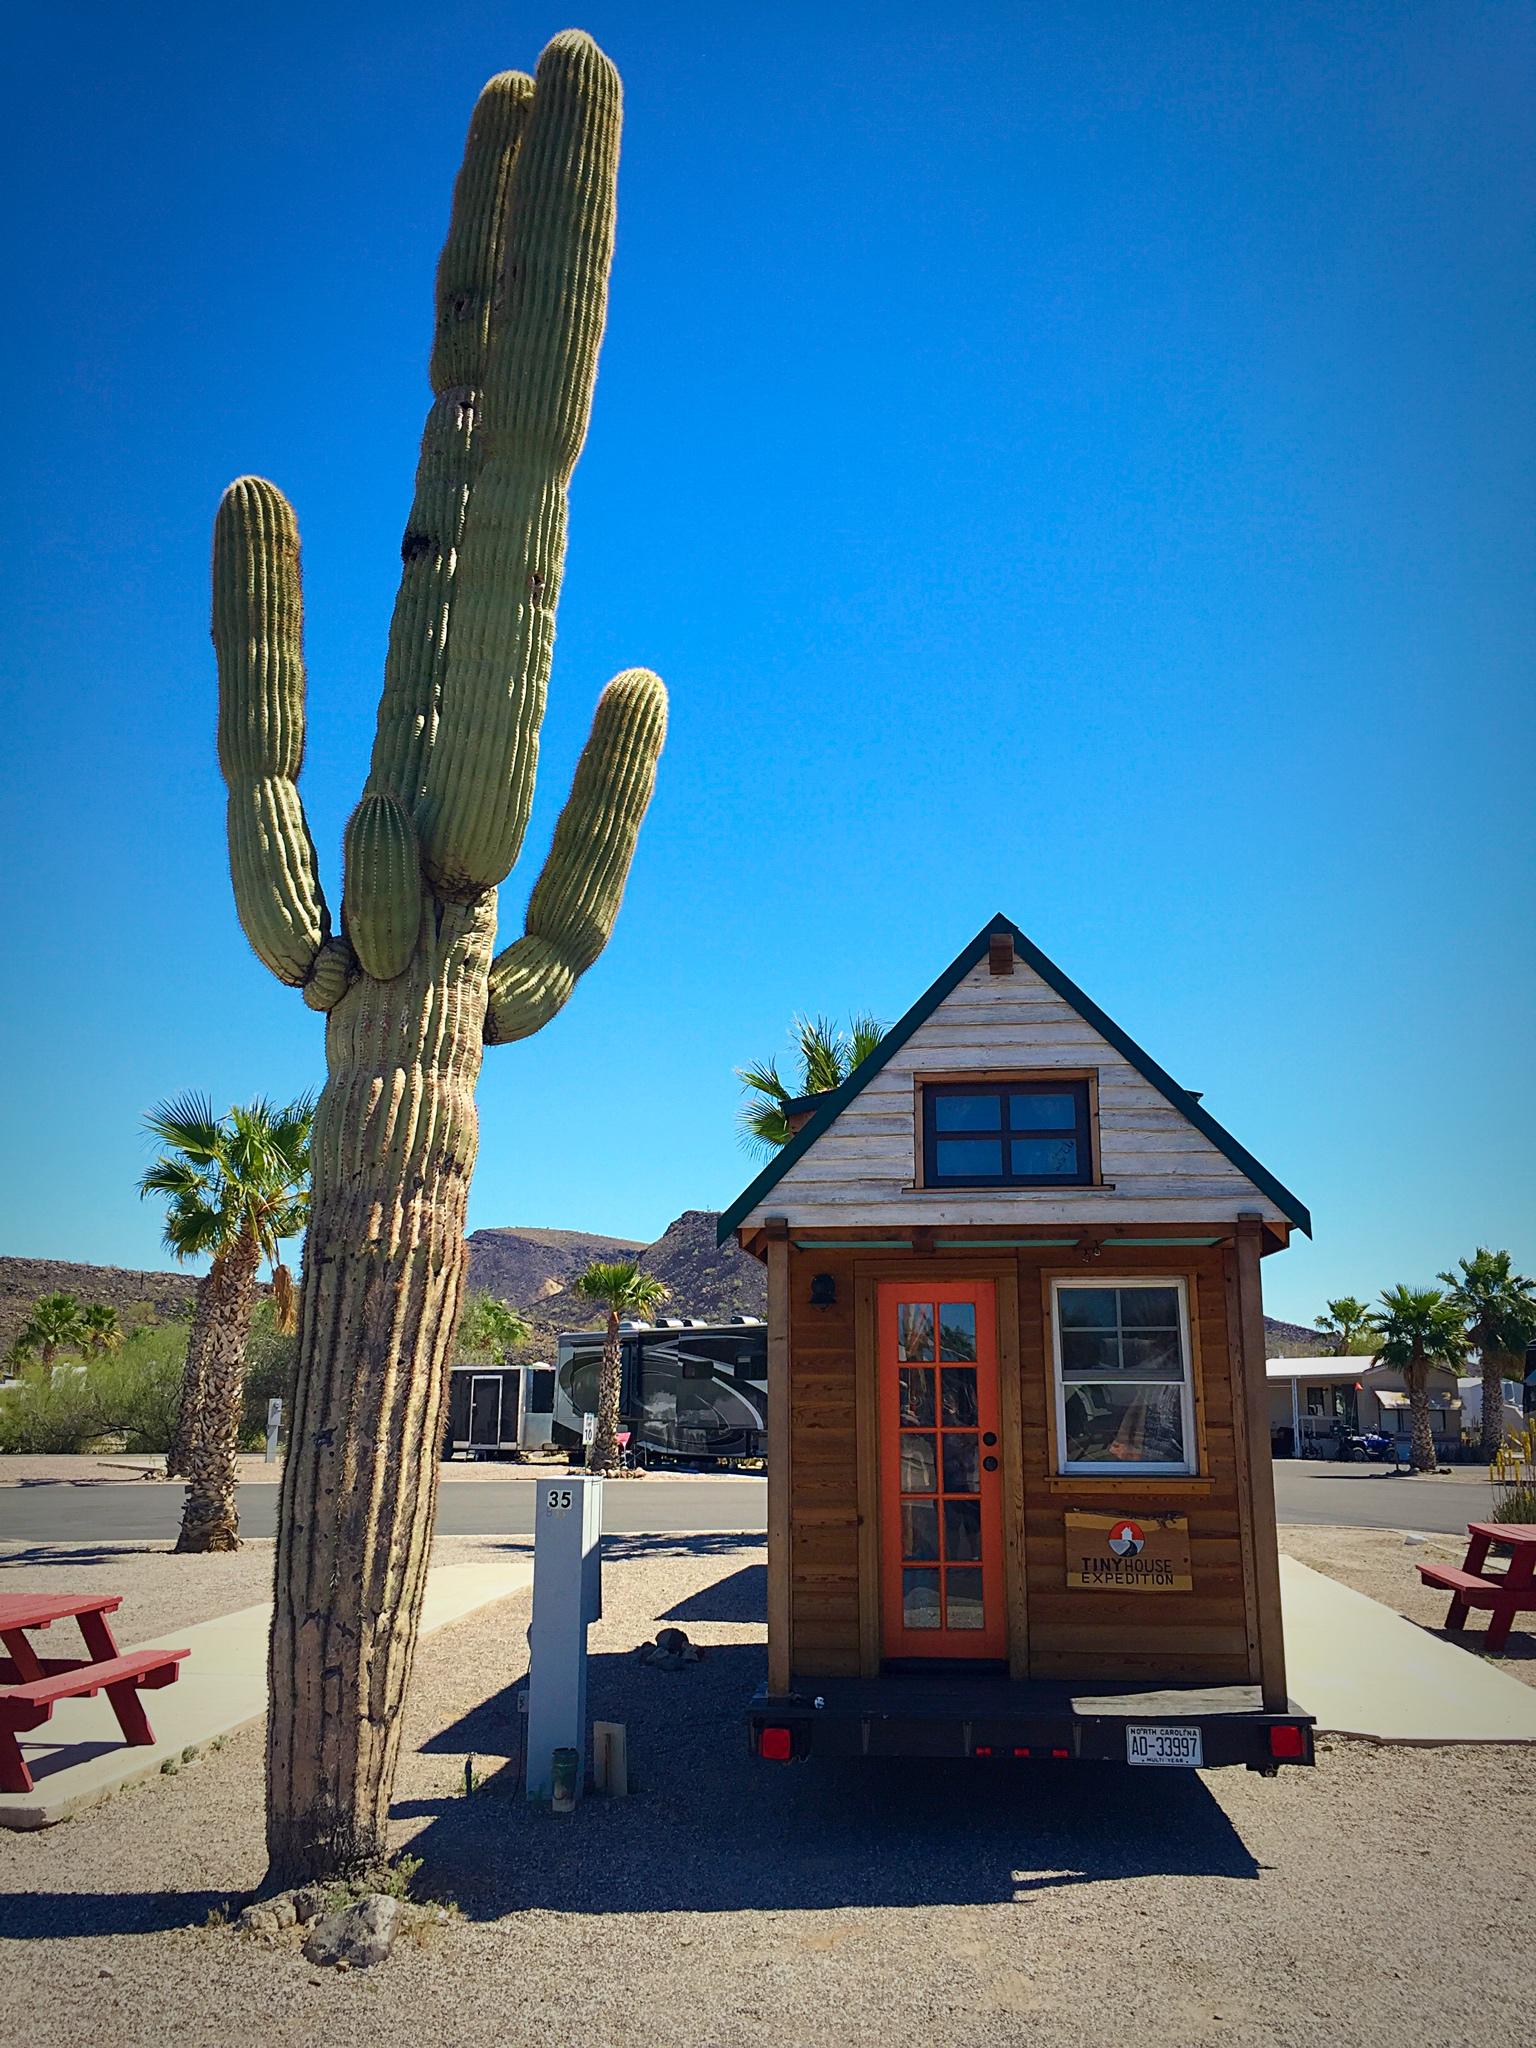 Arizona RV park